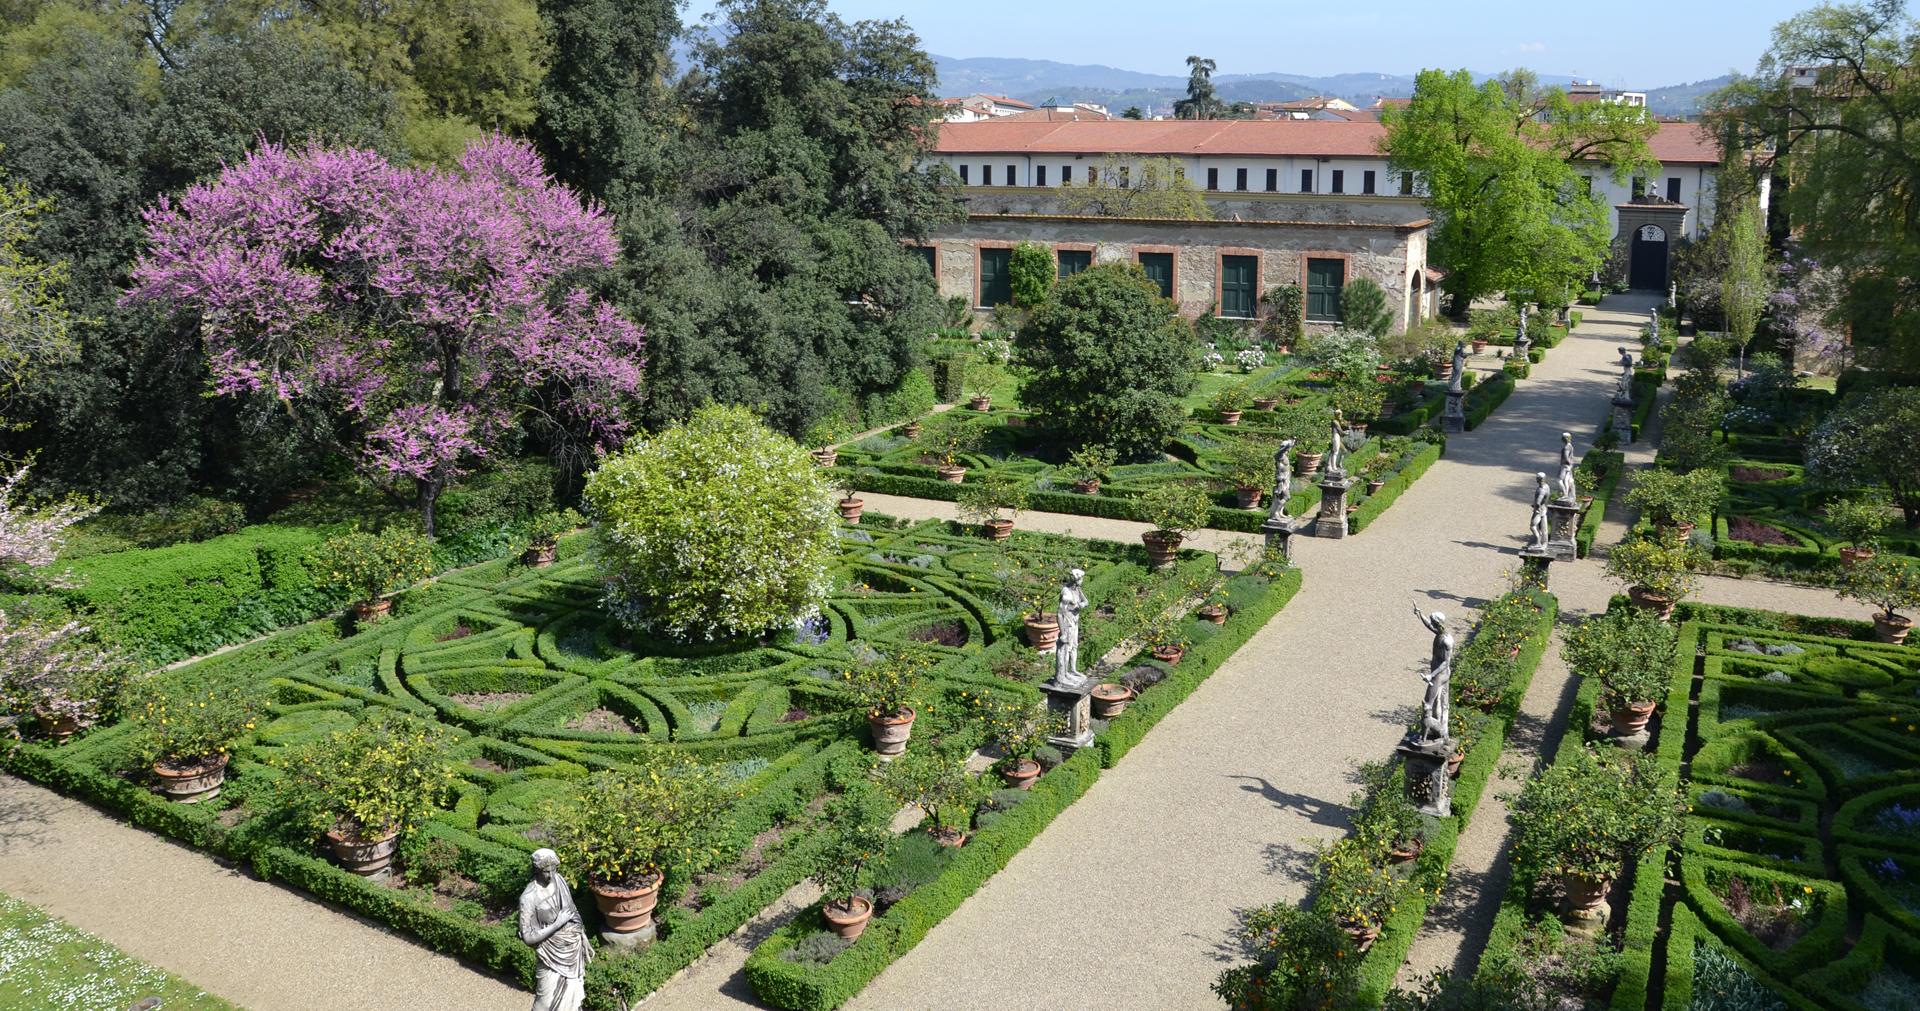 Giardino Corsini